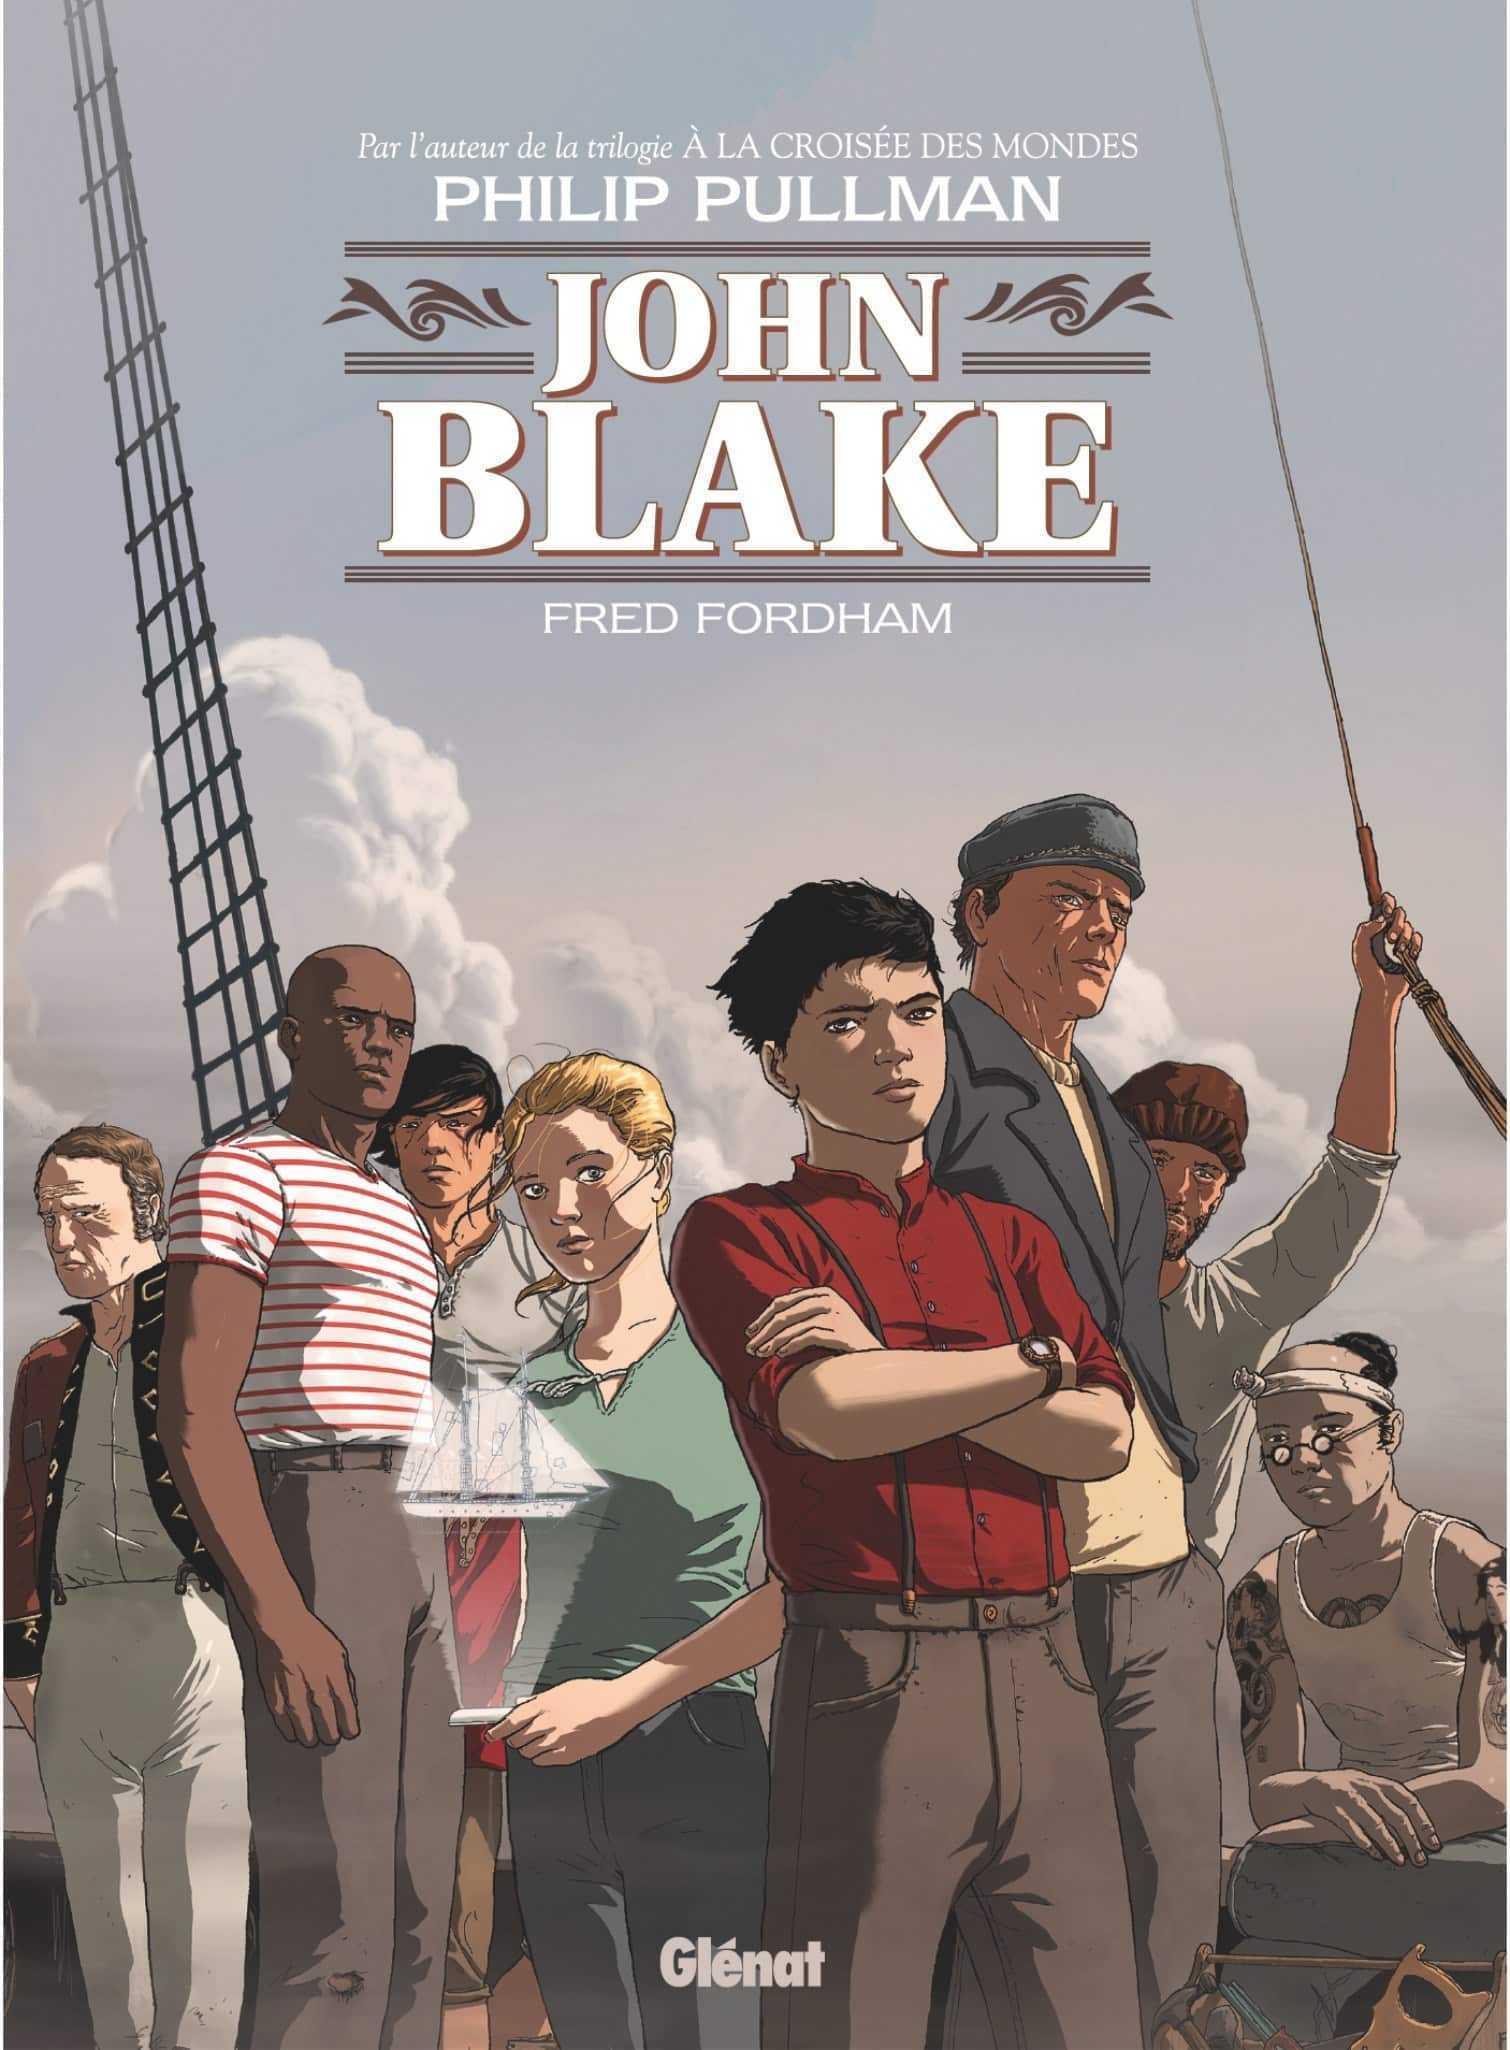 Philip Pullman signe John Blake, aventure maritime et fantastique qui sort fin août 2019